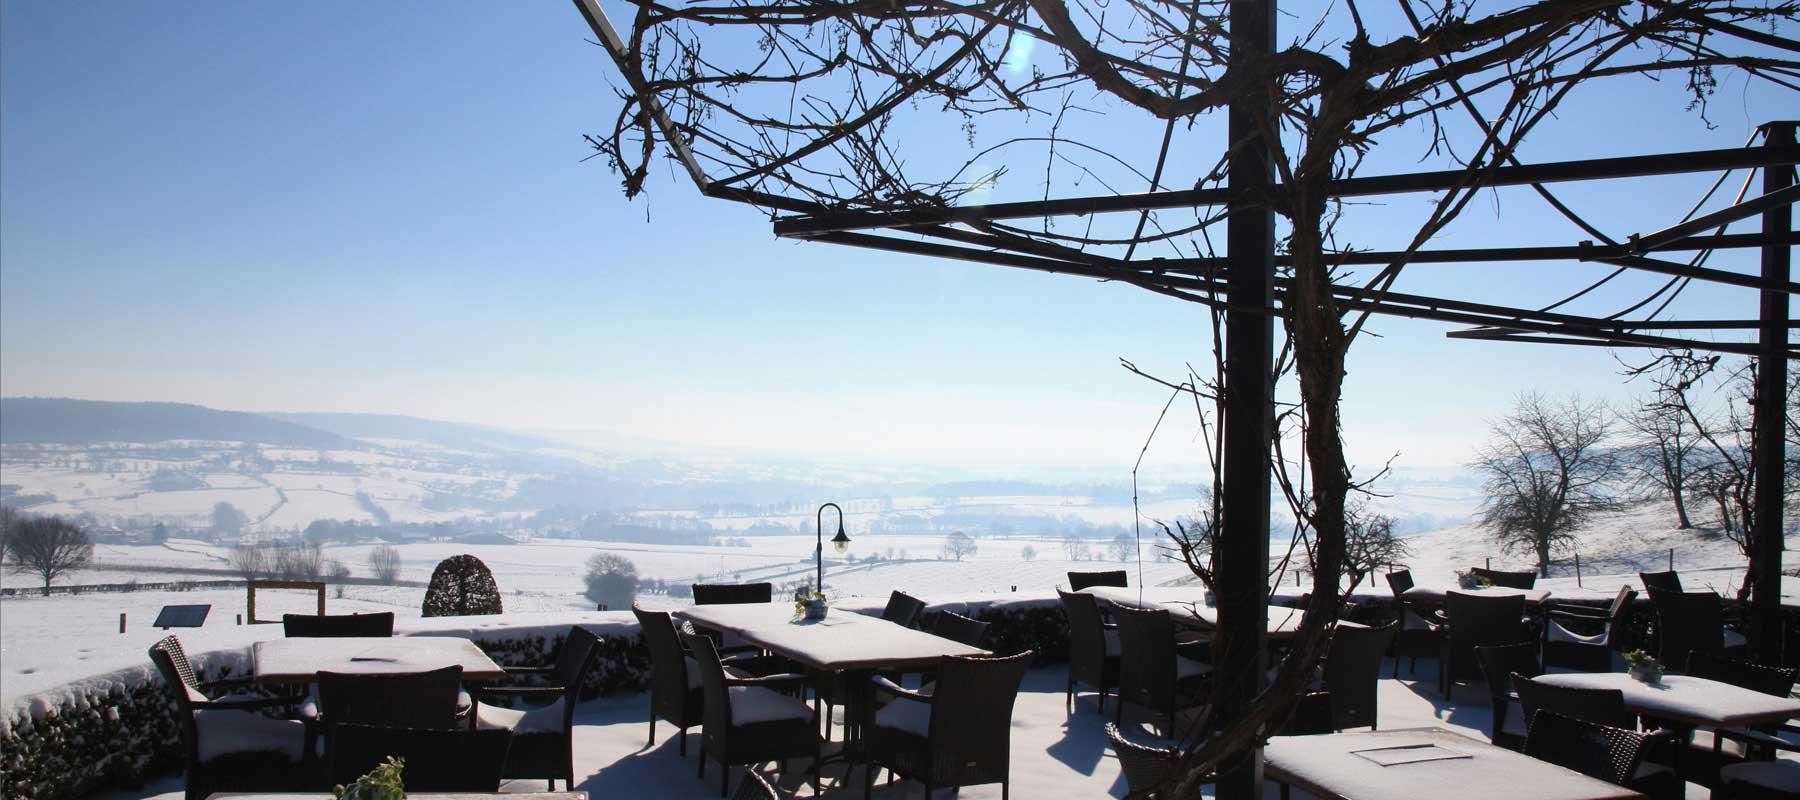 Winter natuur puur arrangement hotel gerardushoeve heijenrath heuvelland zuid limburg - Terras arrangement ...